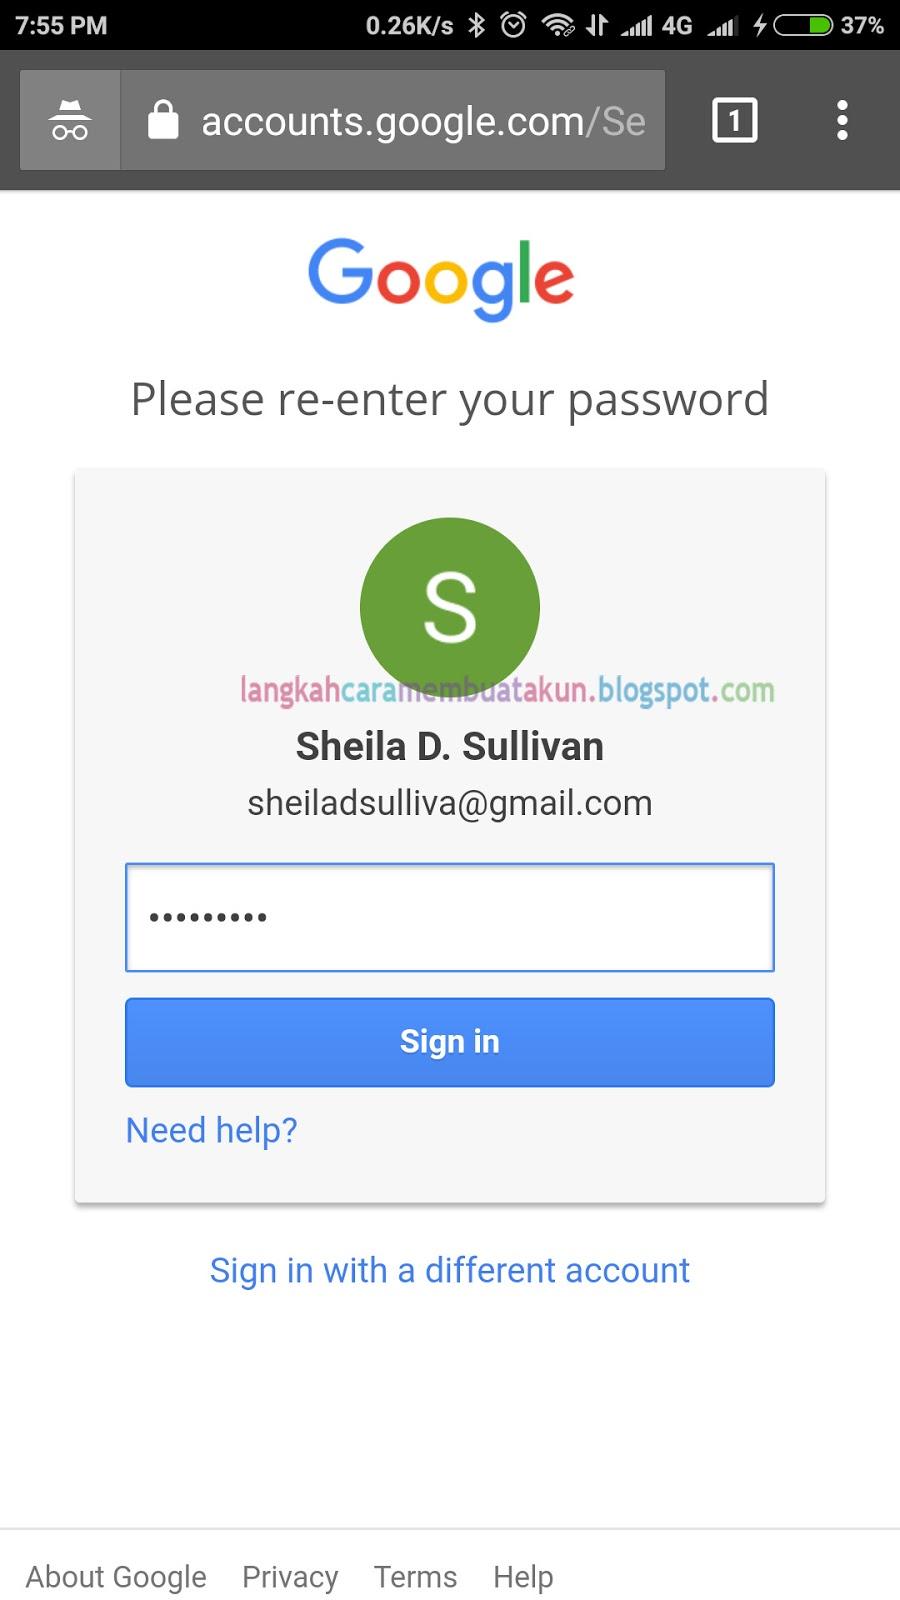 Cara Menyetel Ulang Sandi Gmail | Ubah Kata Sandi Email